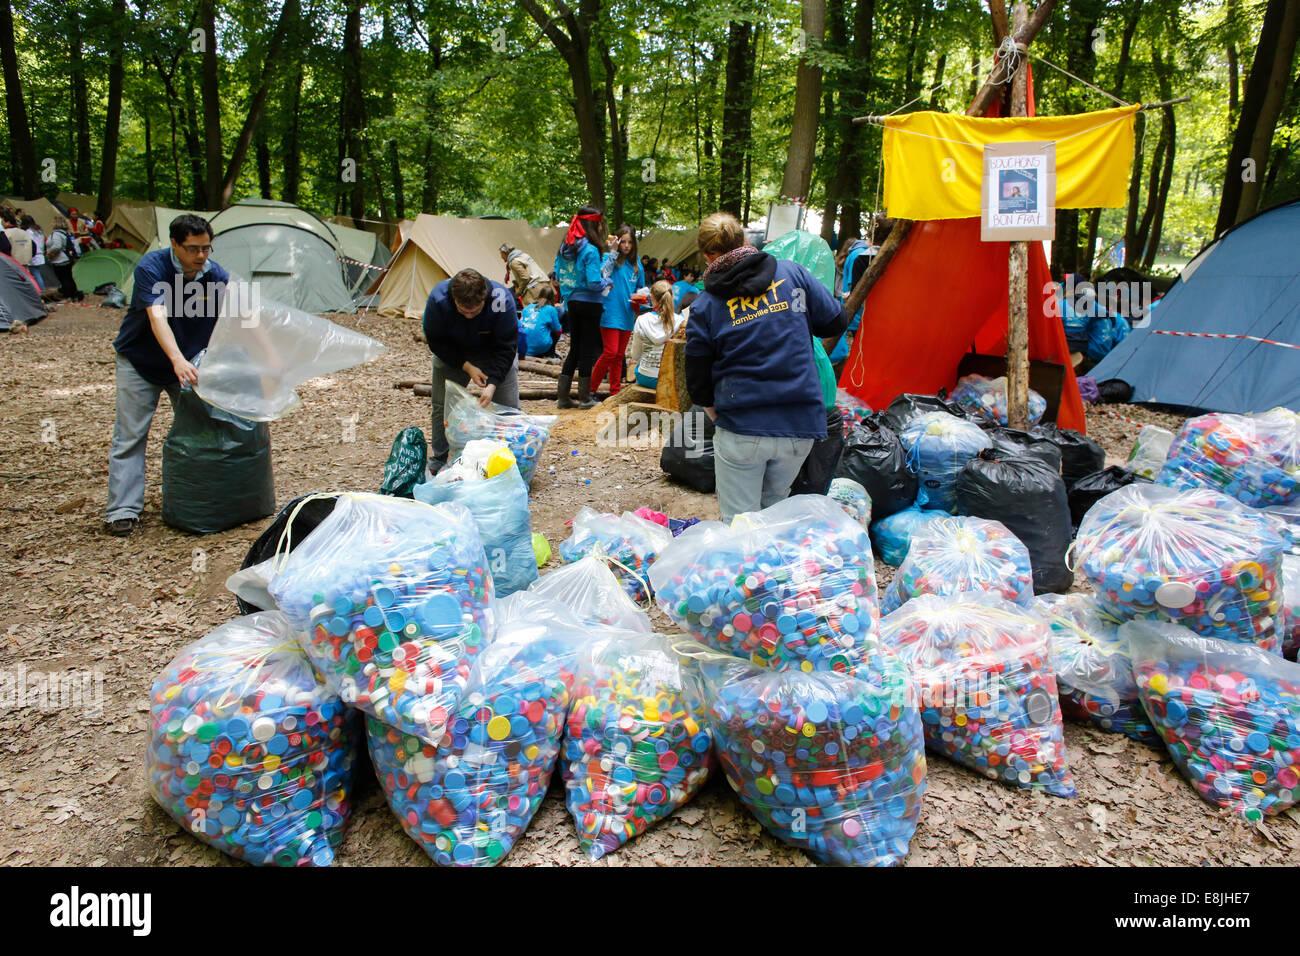 FRAT young catholics' gathering. Scrap recycling - Stock Image